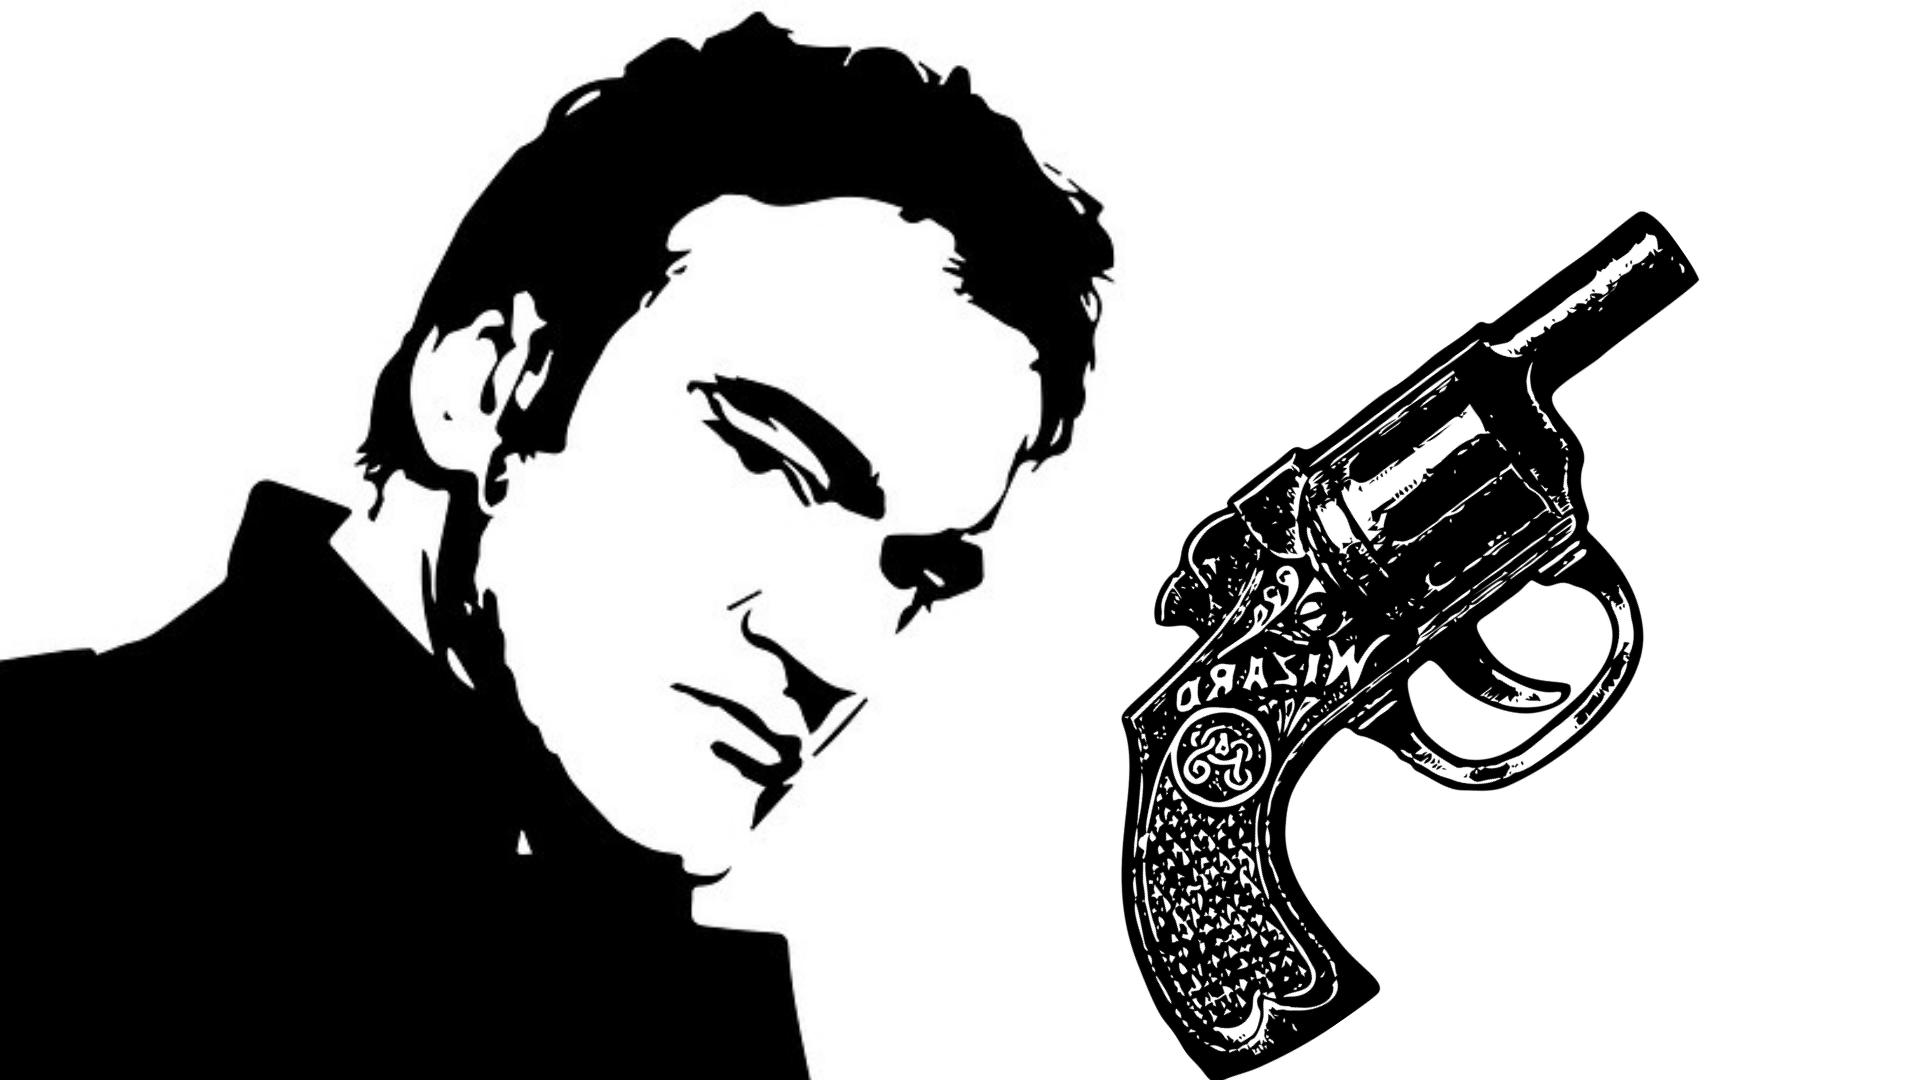 A Tarantino le tiramos de las orejillas